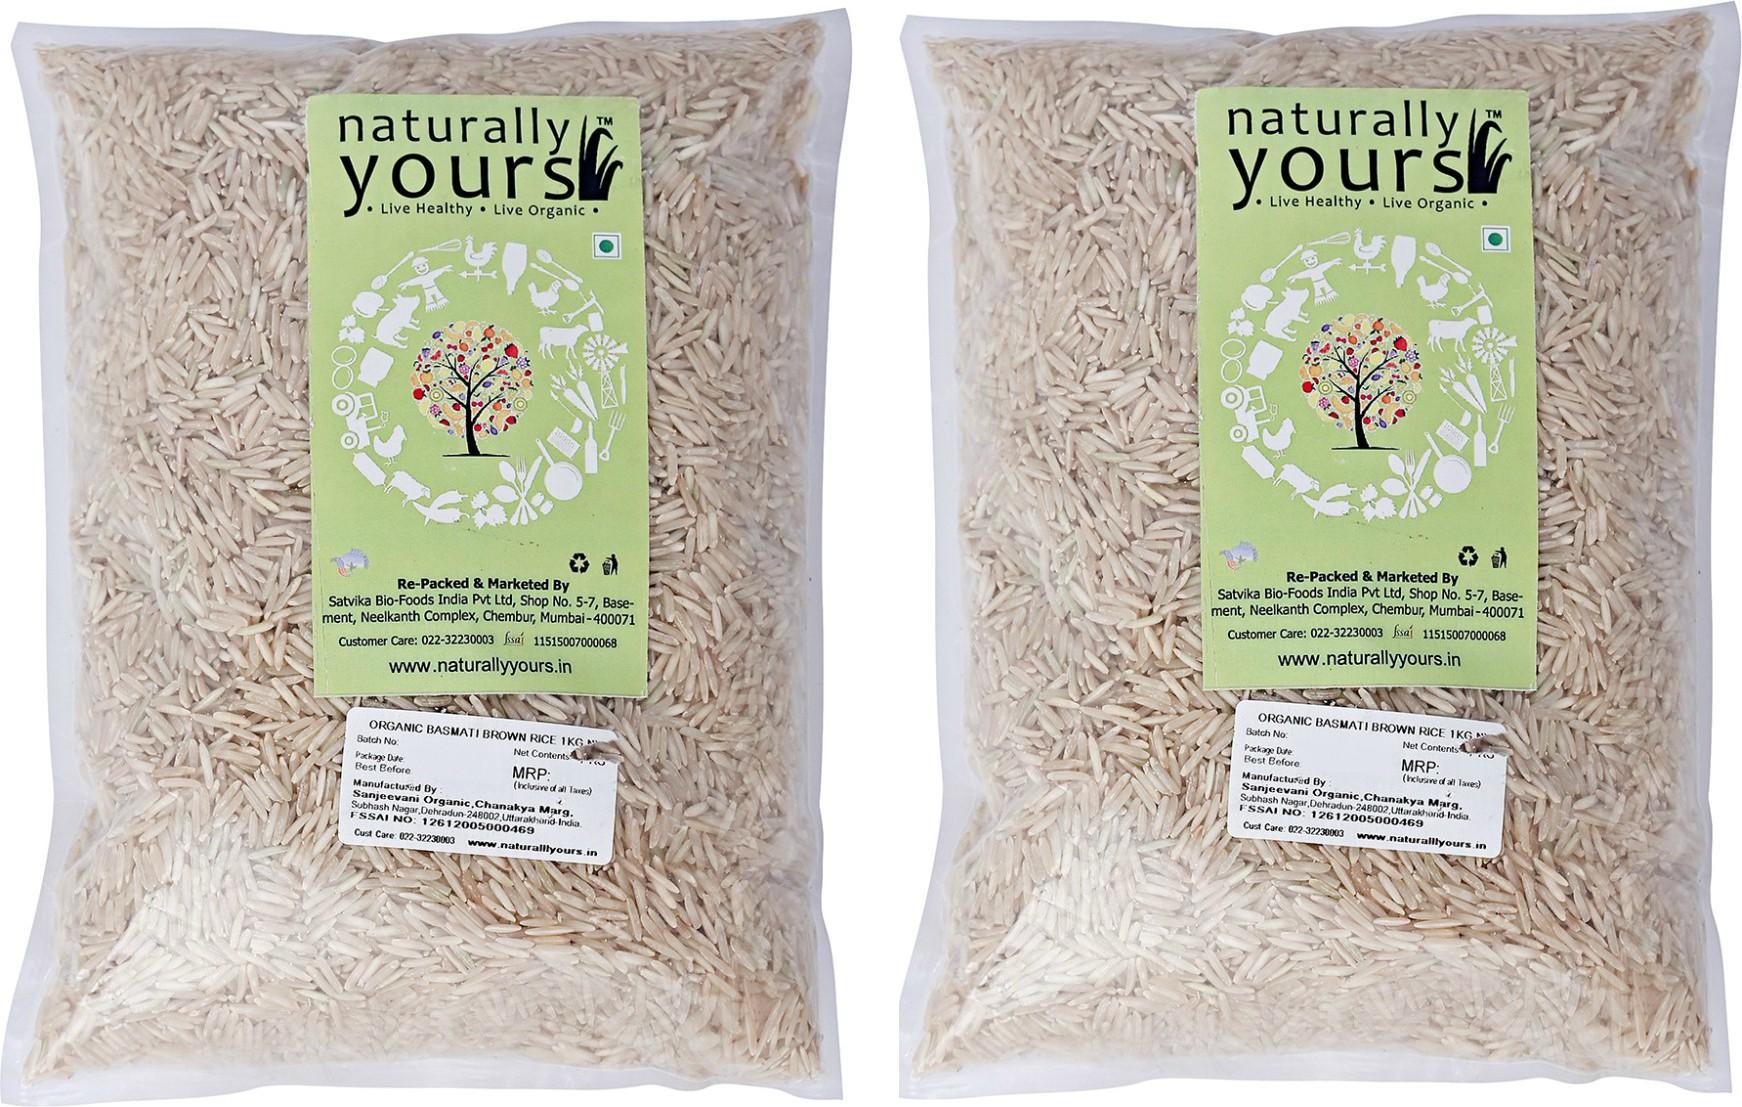 Naturally Yours Basmati Brown Rice